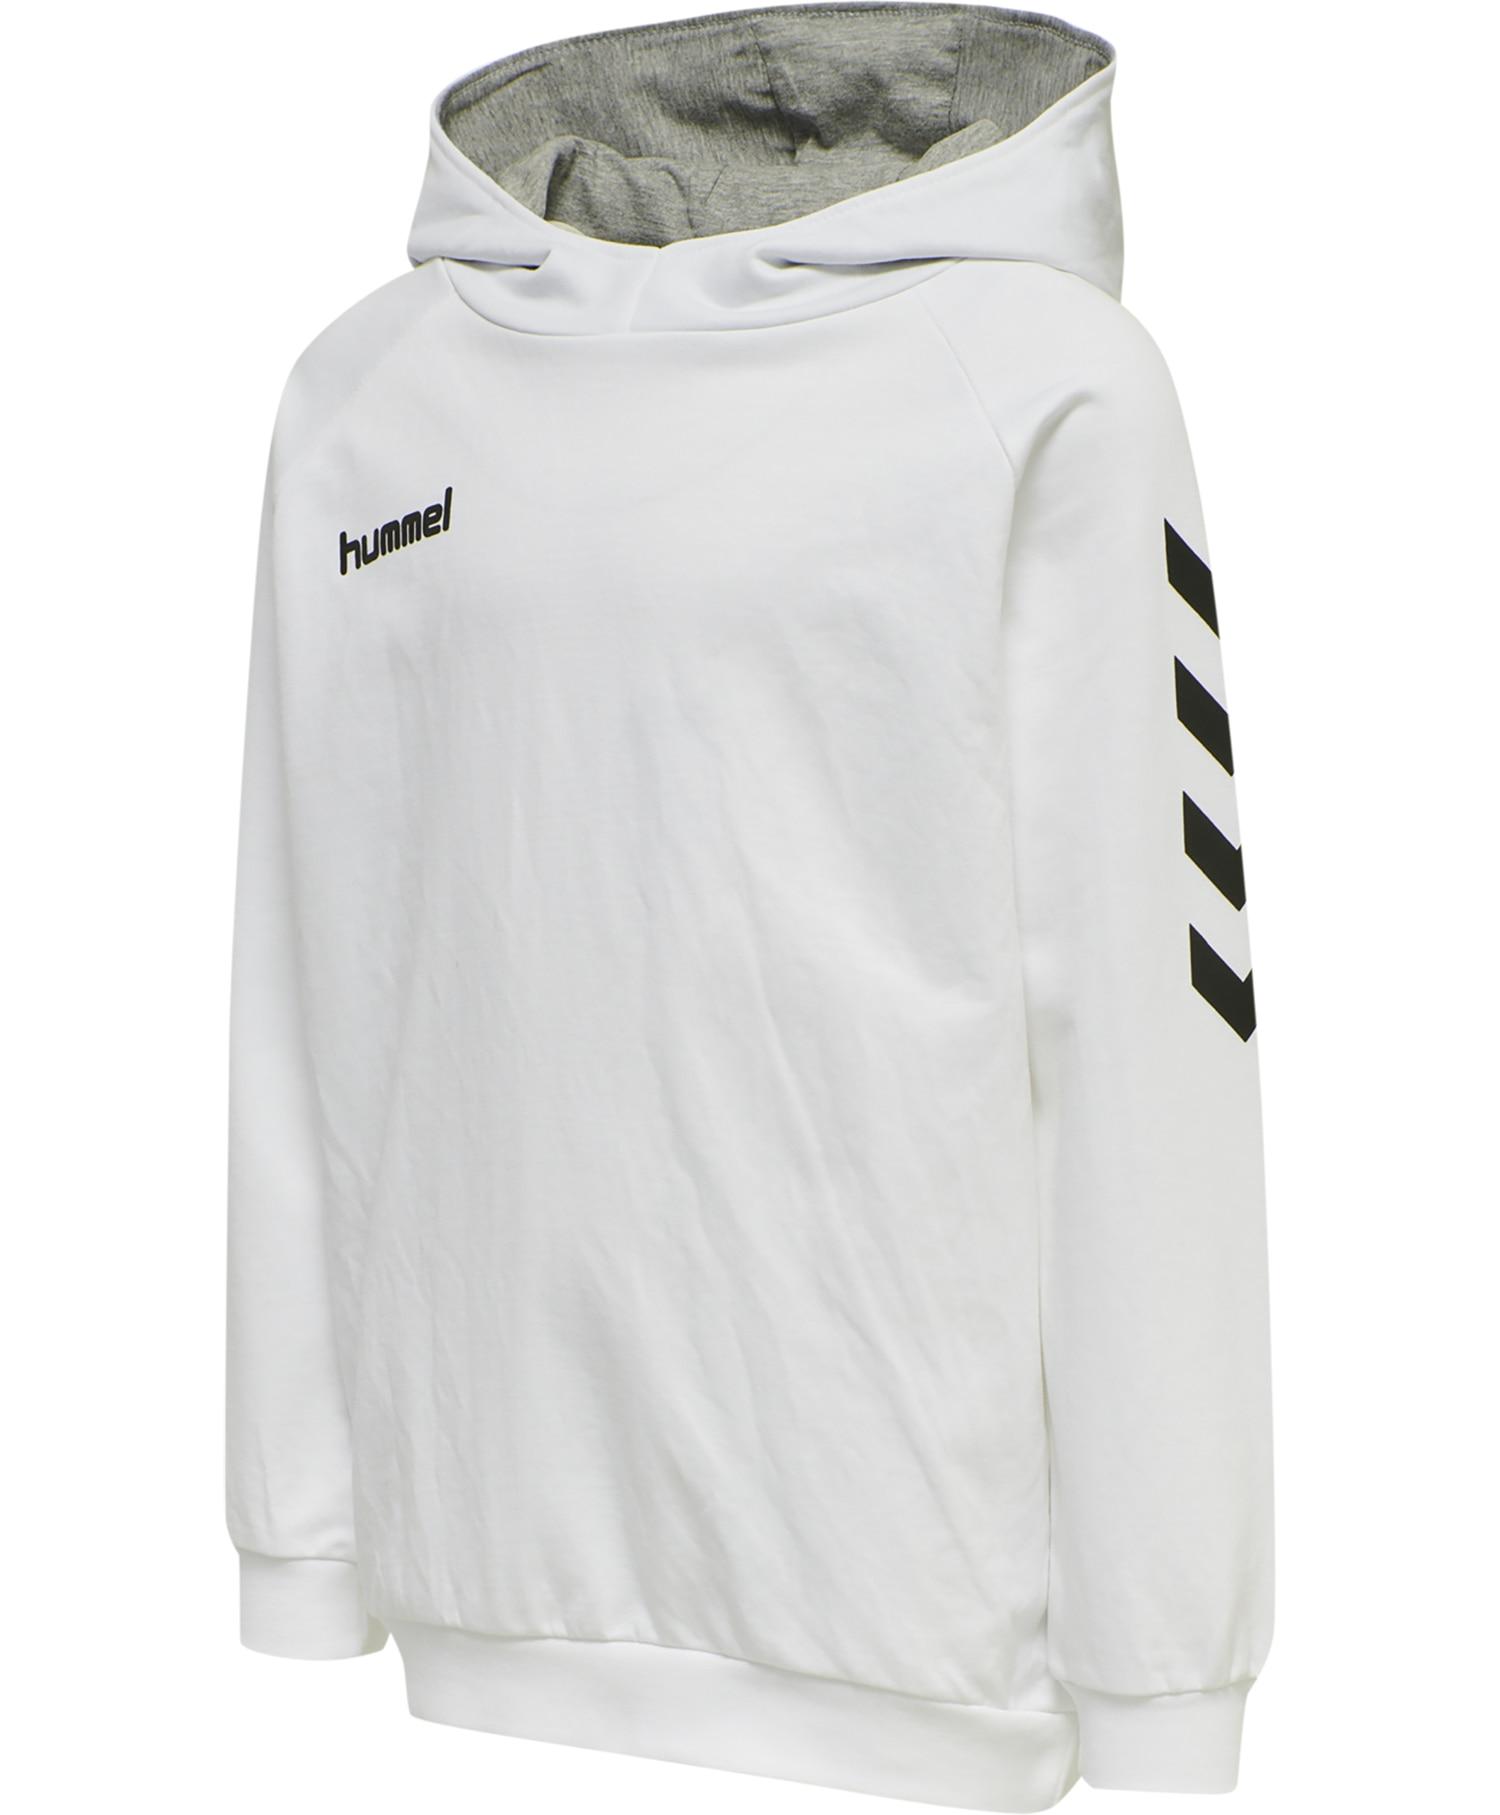 Hummel cotton hoodie